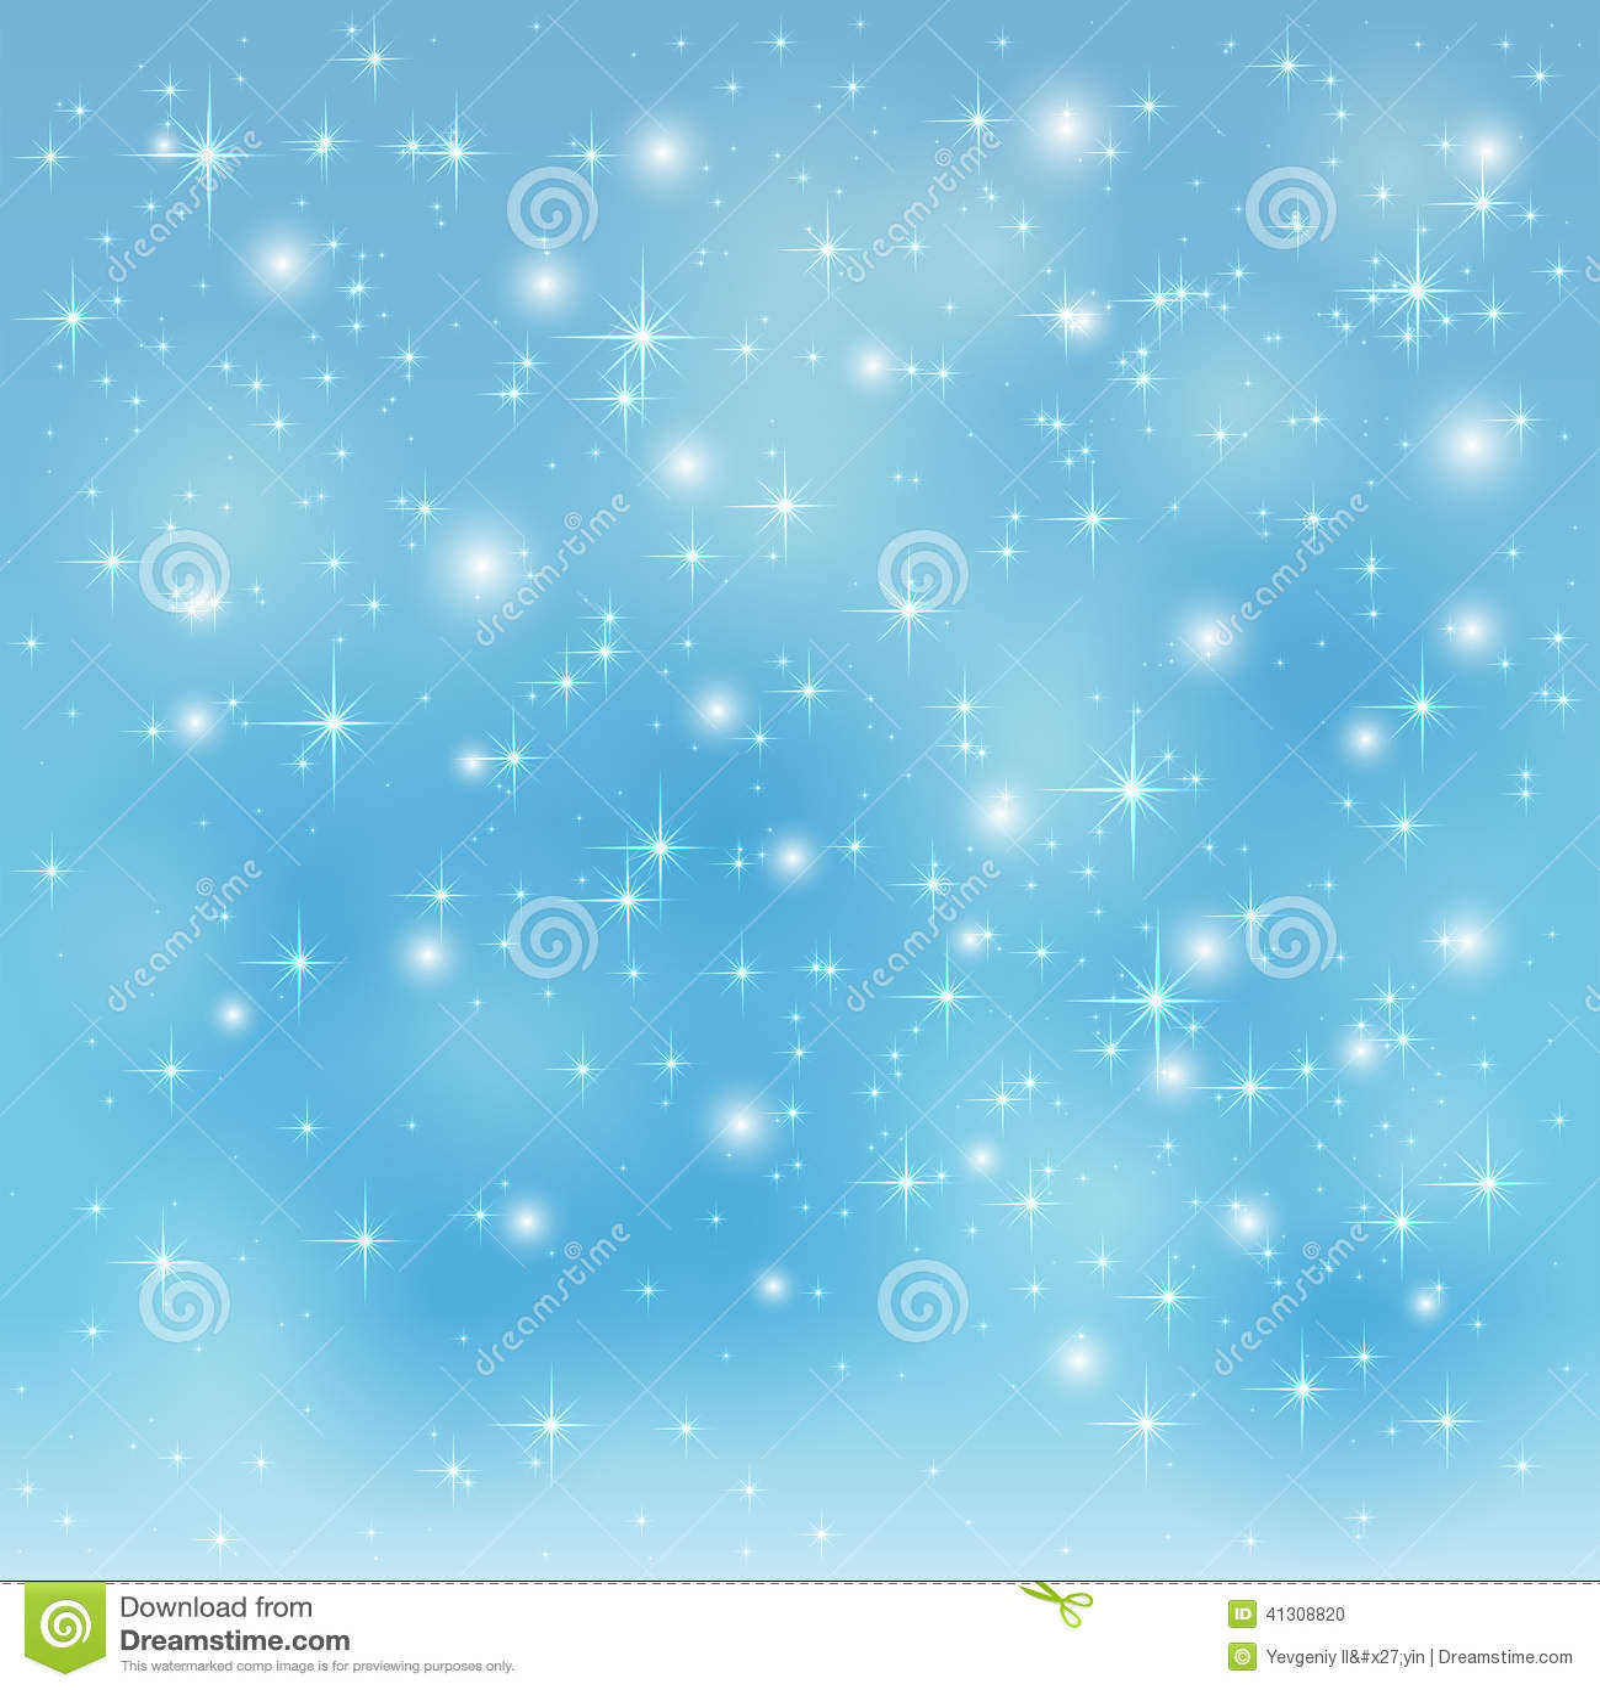 Light 4 Lines - Azul